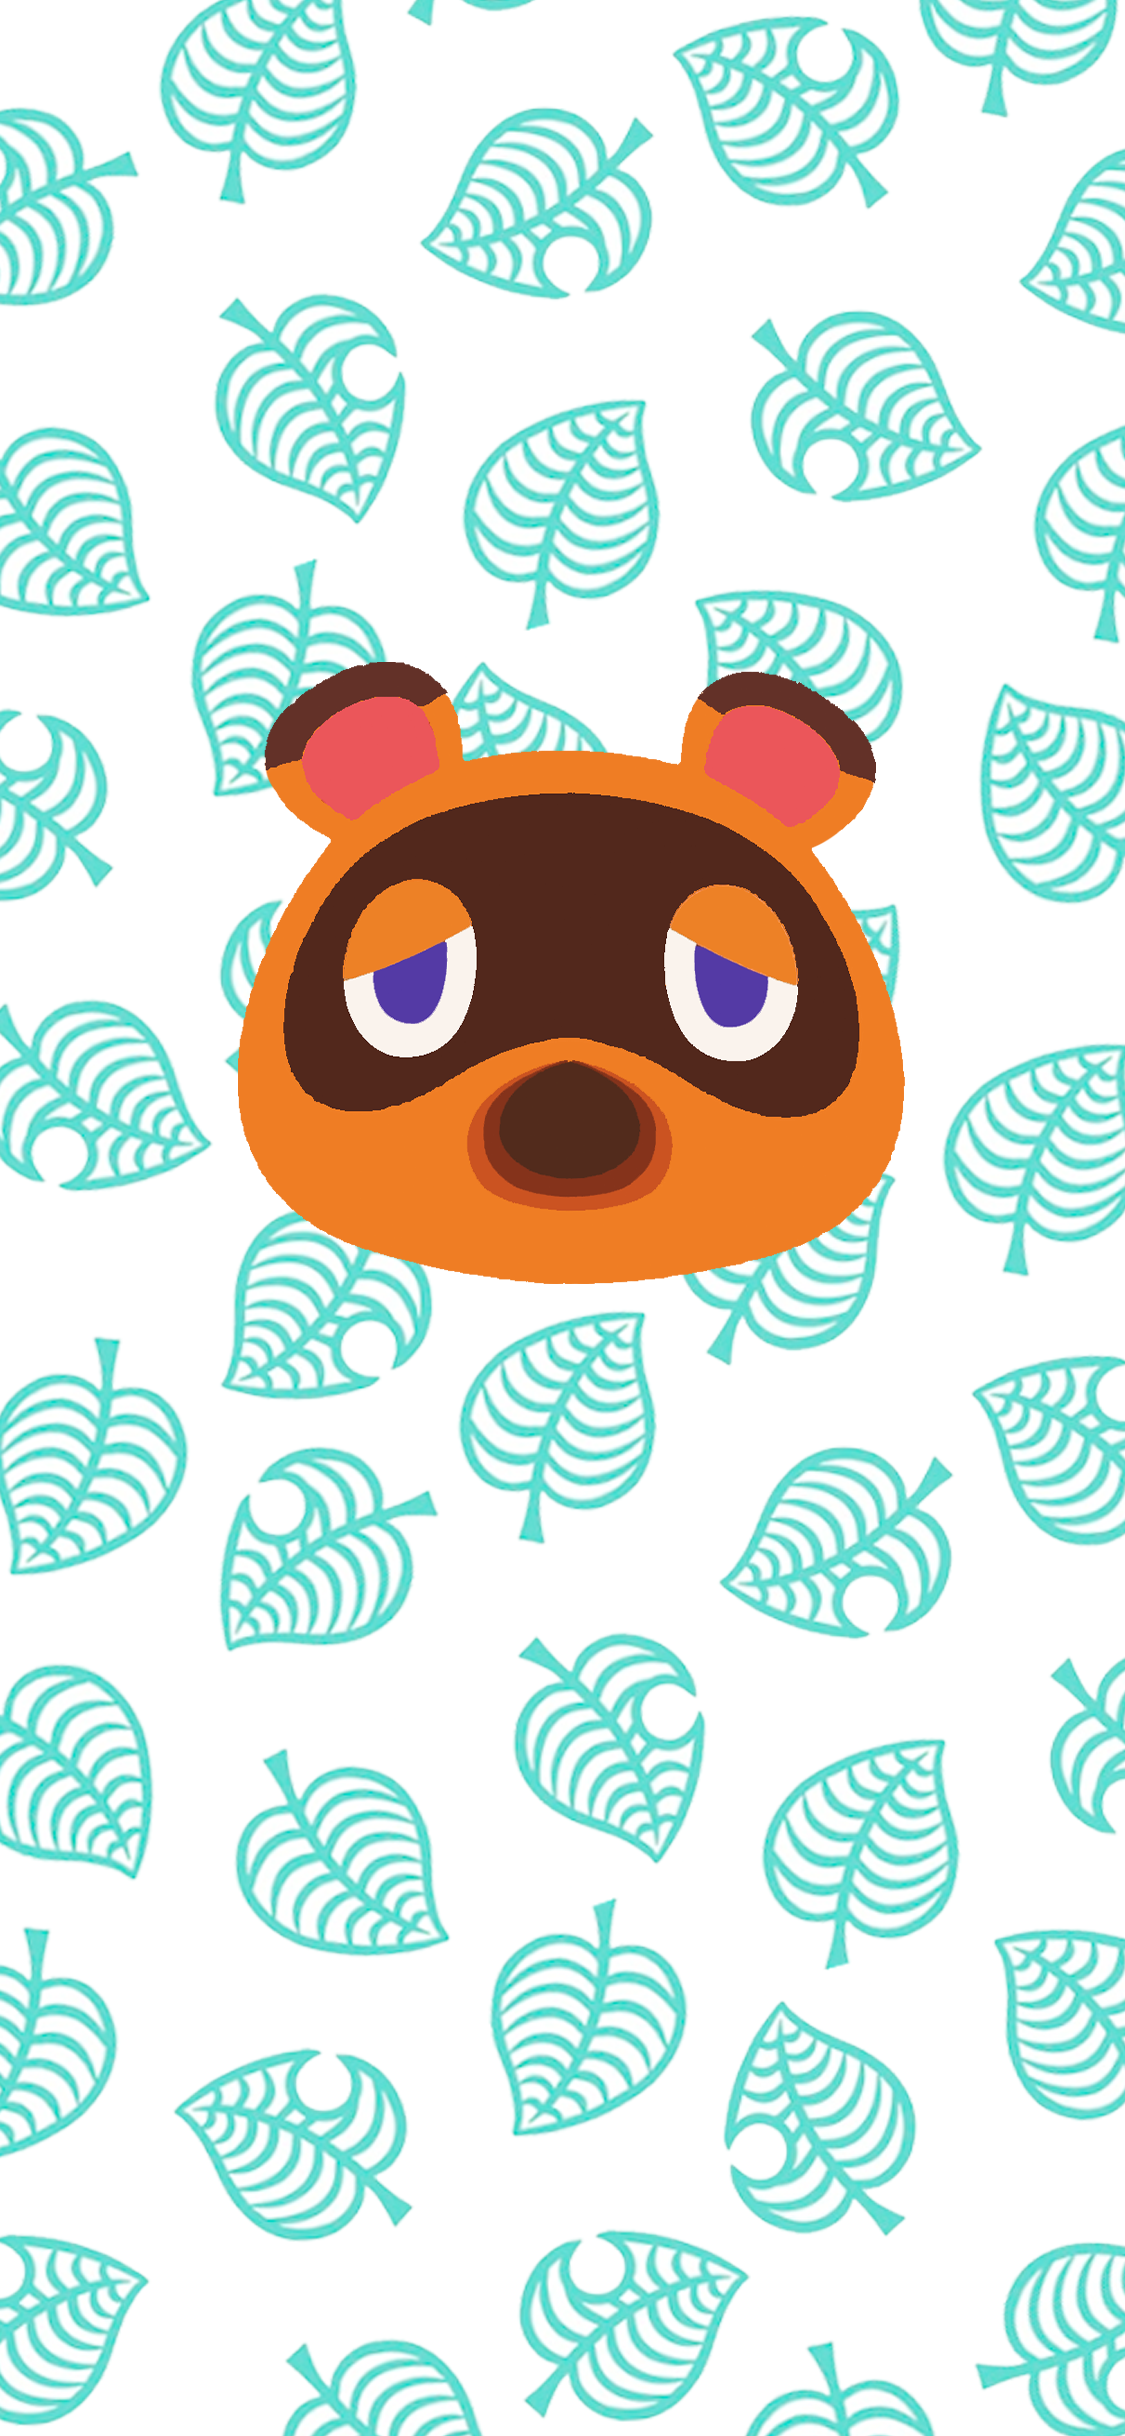 background animal crossing wallpaper designs